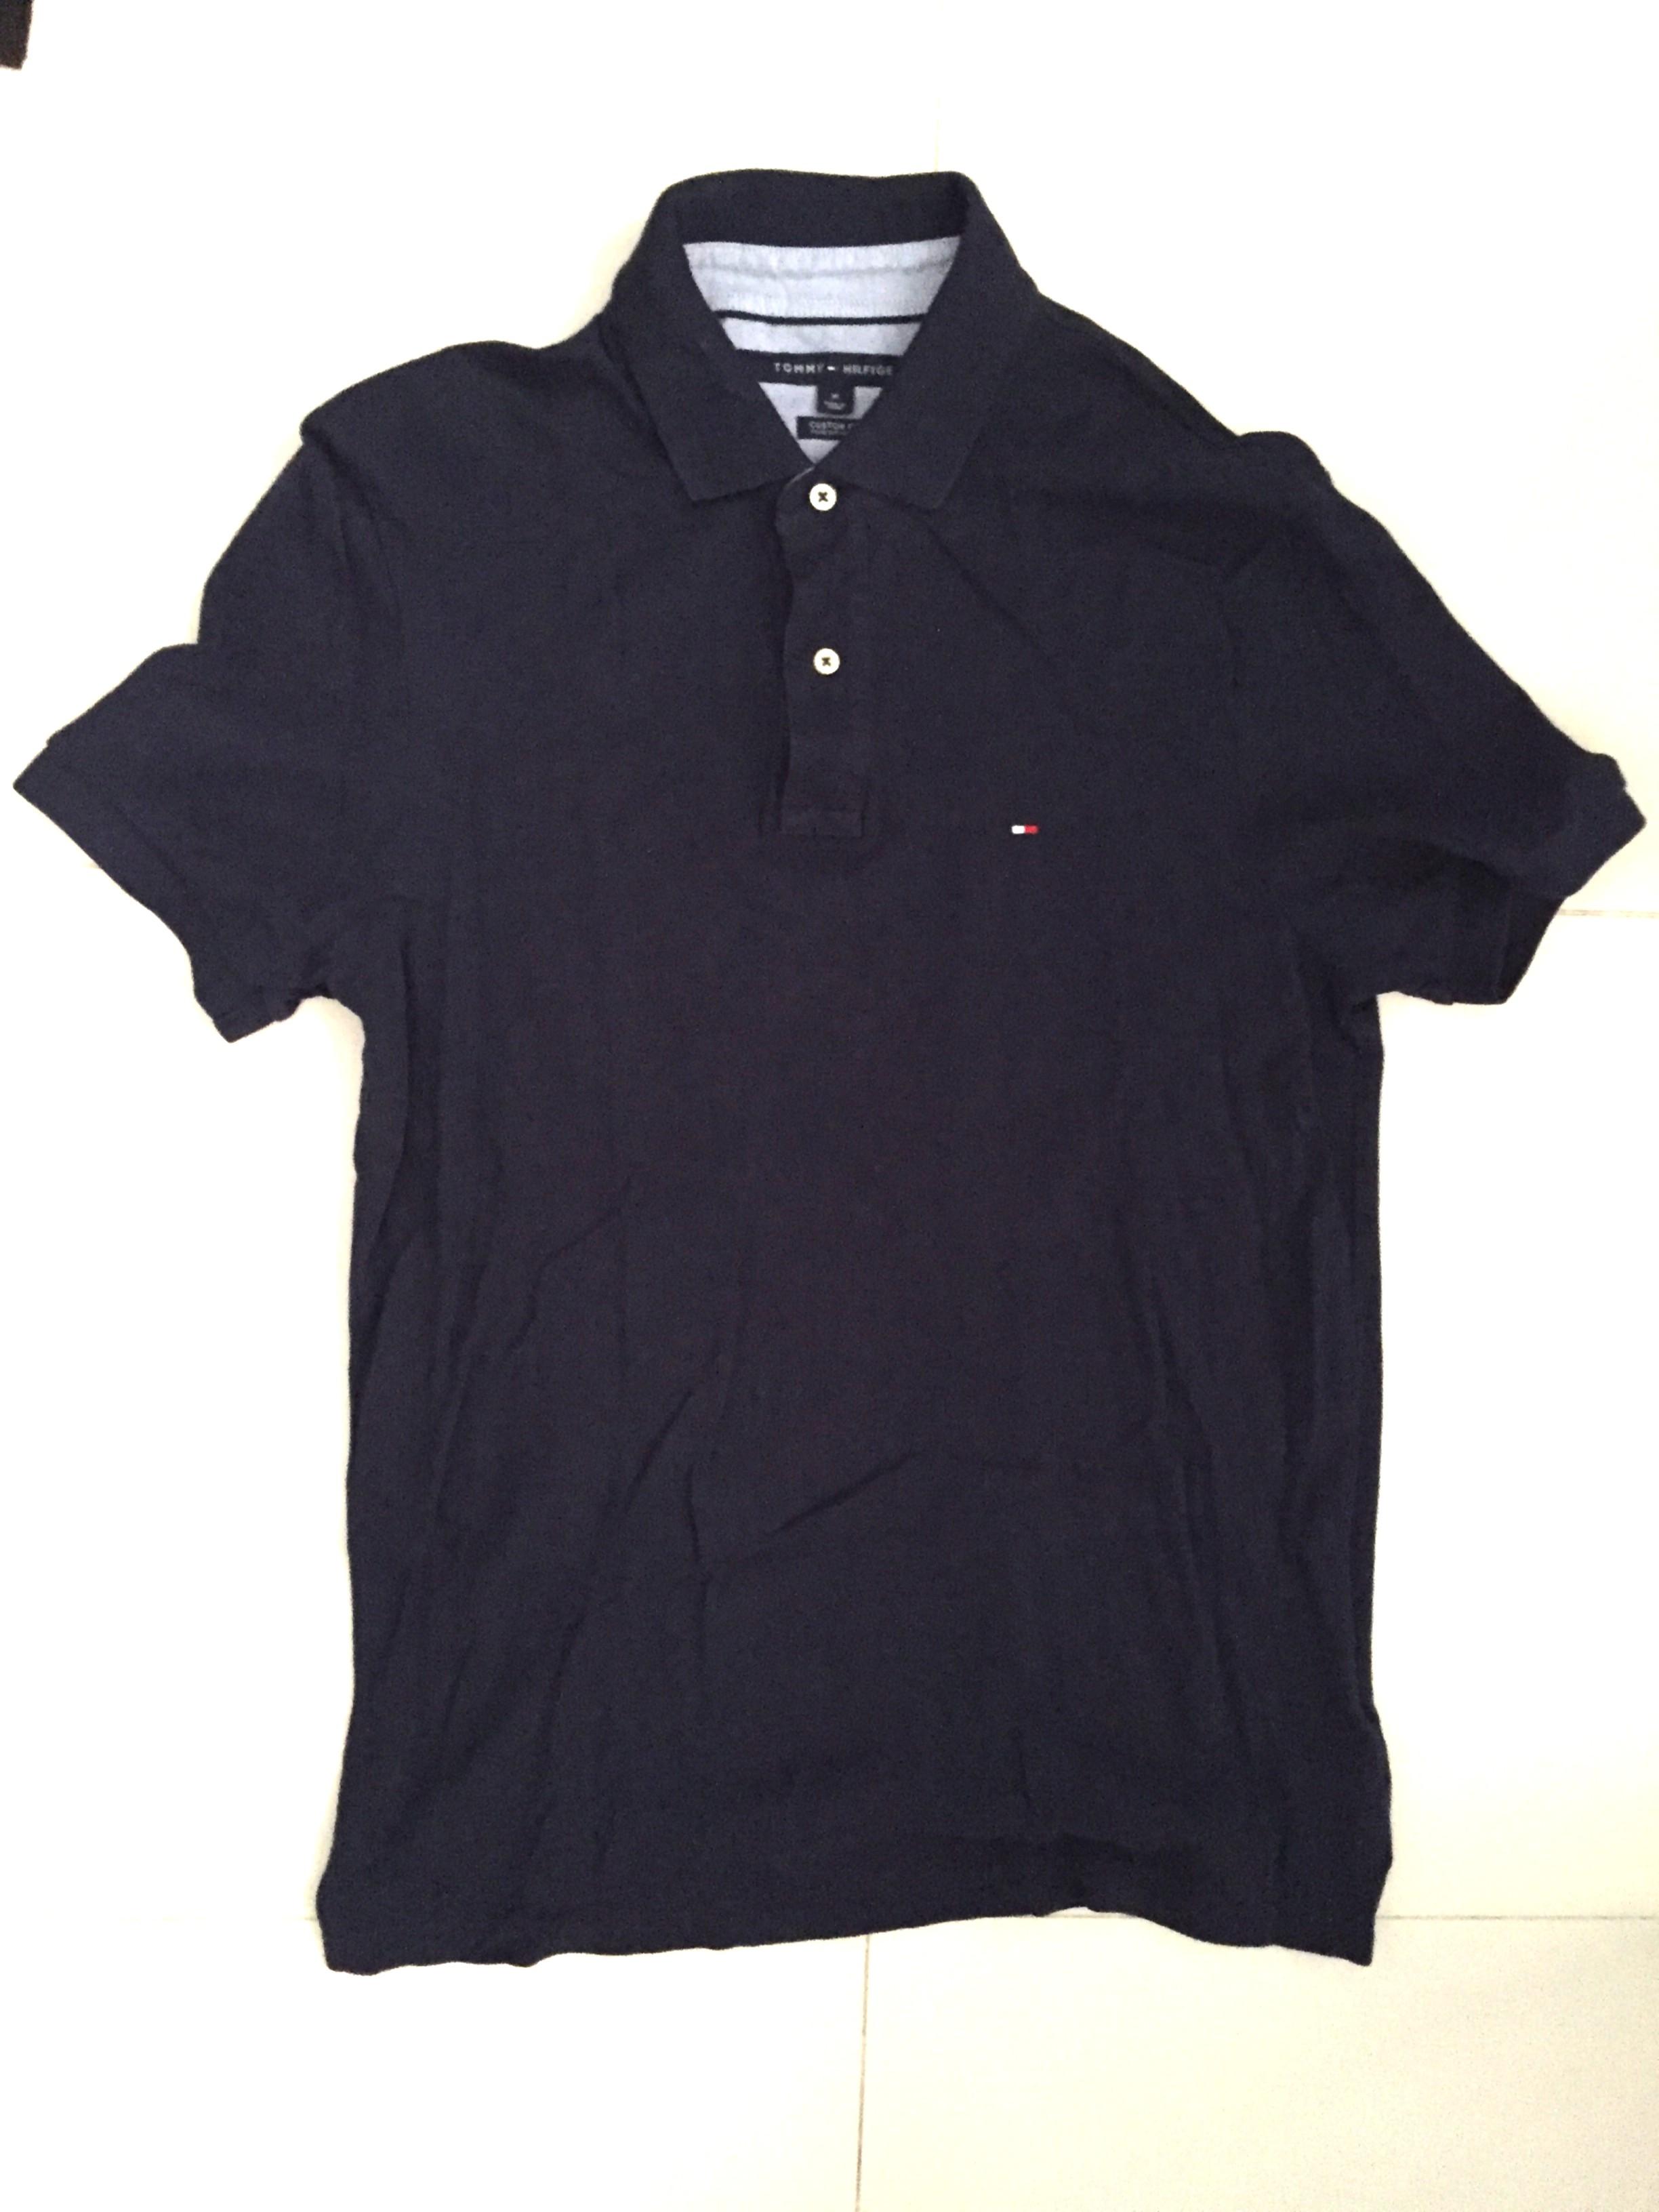 e27ef4de Tommy Hilfiger polo tee (Custom Fit), Men's Fashion, Clothes, Tops ...